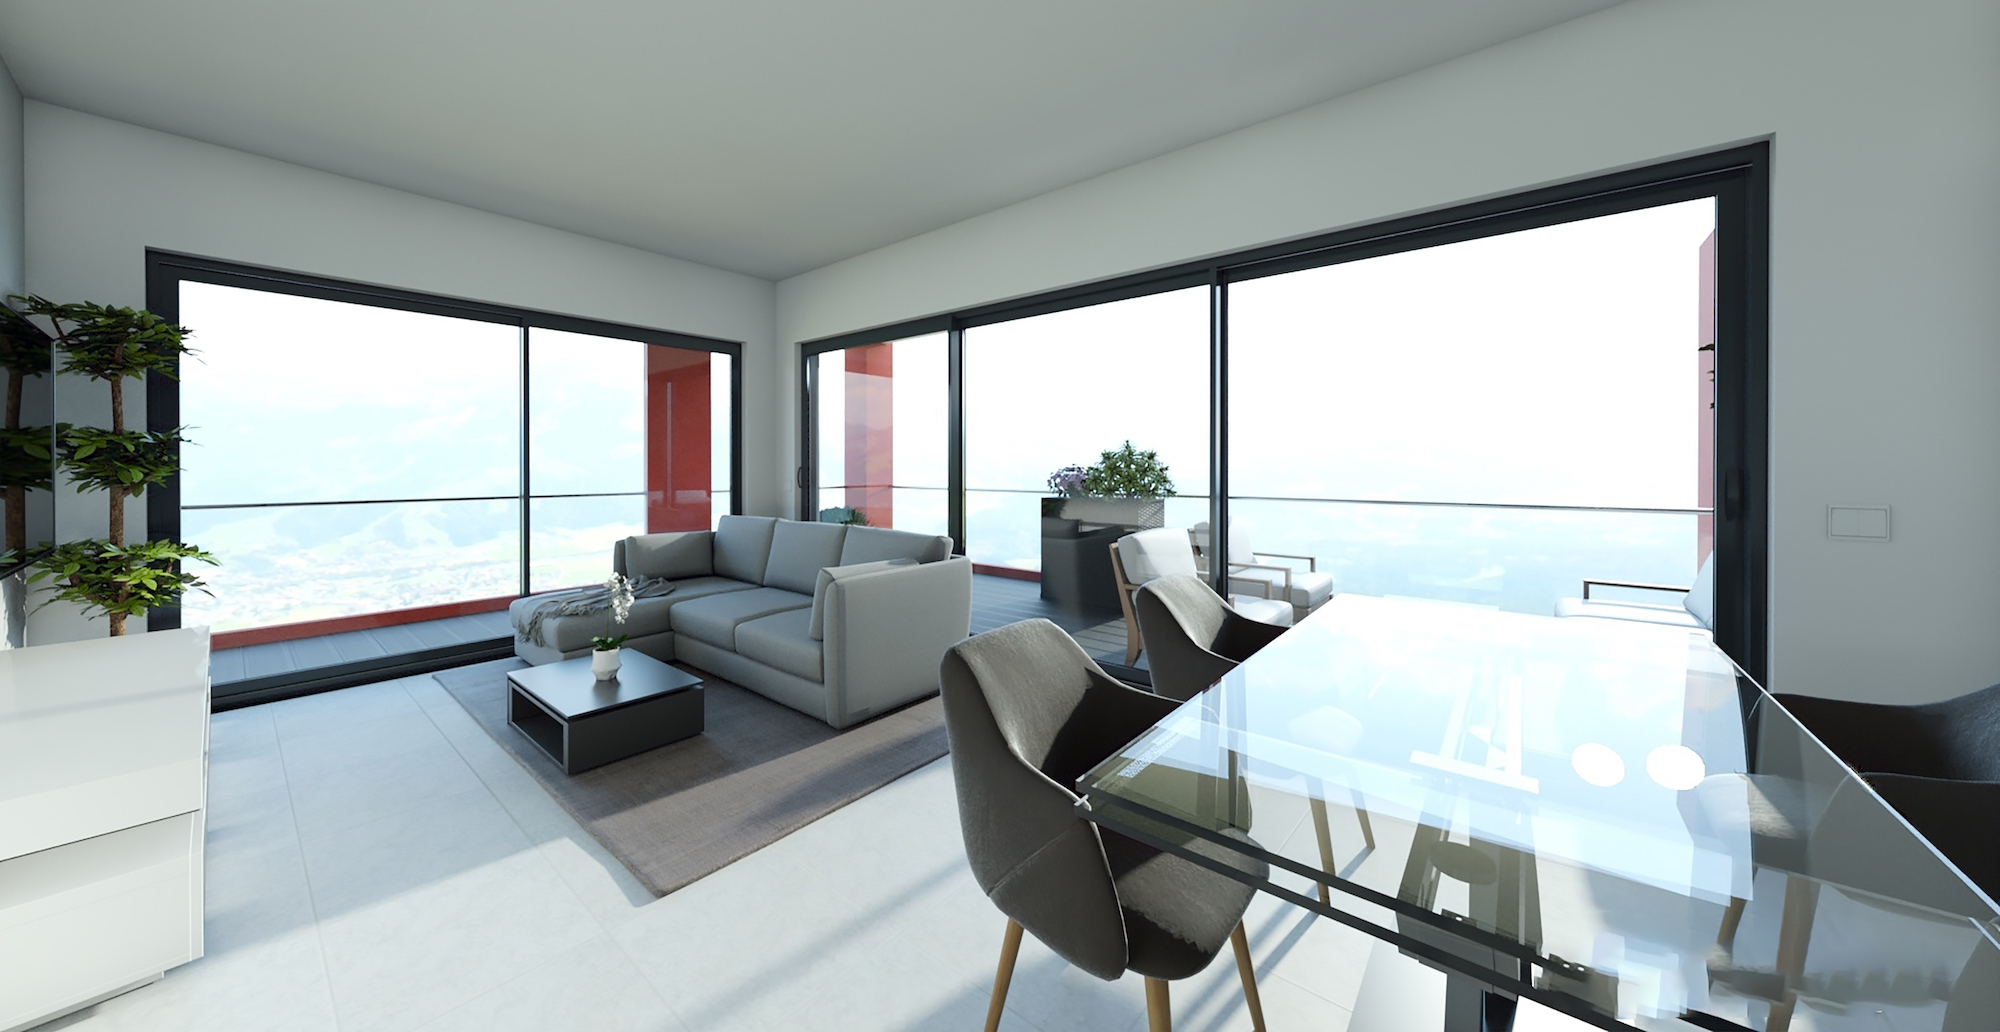 Roquebrune-Cap-Martin Penthouse de 144 M2 avec vue mer(EN)